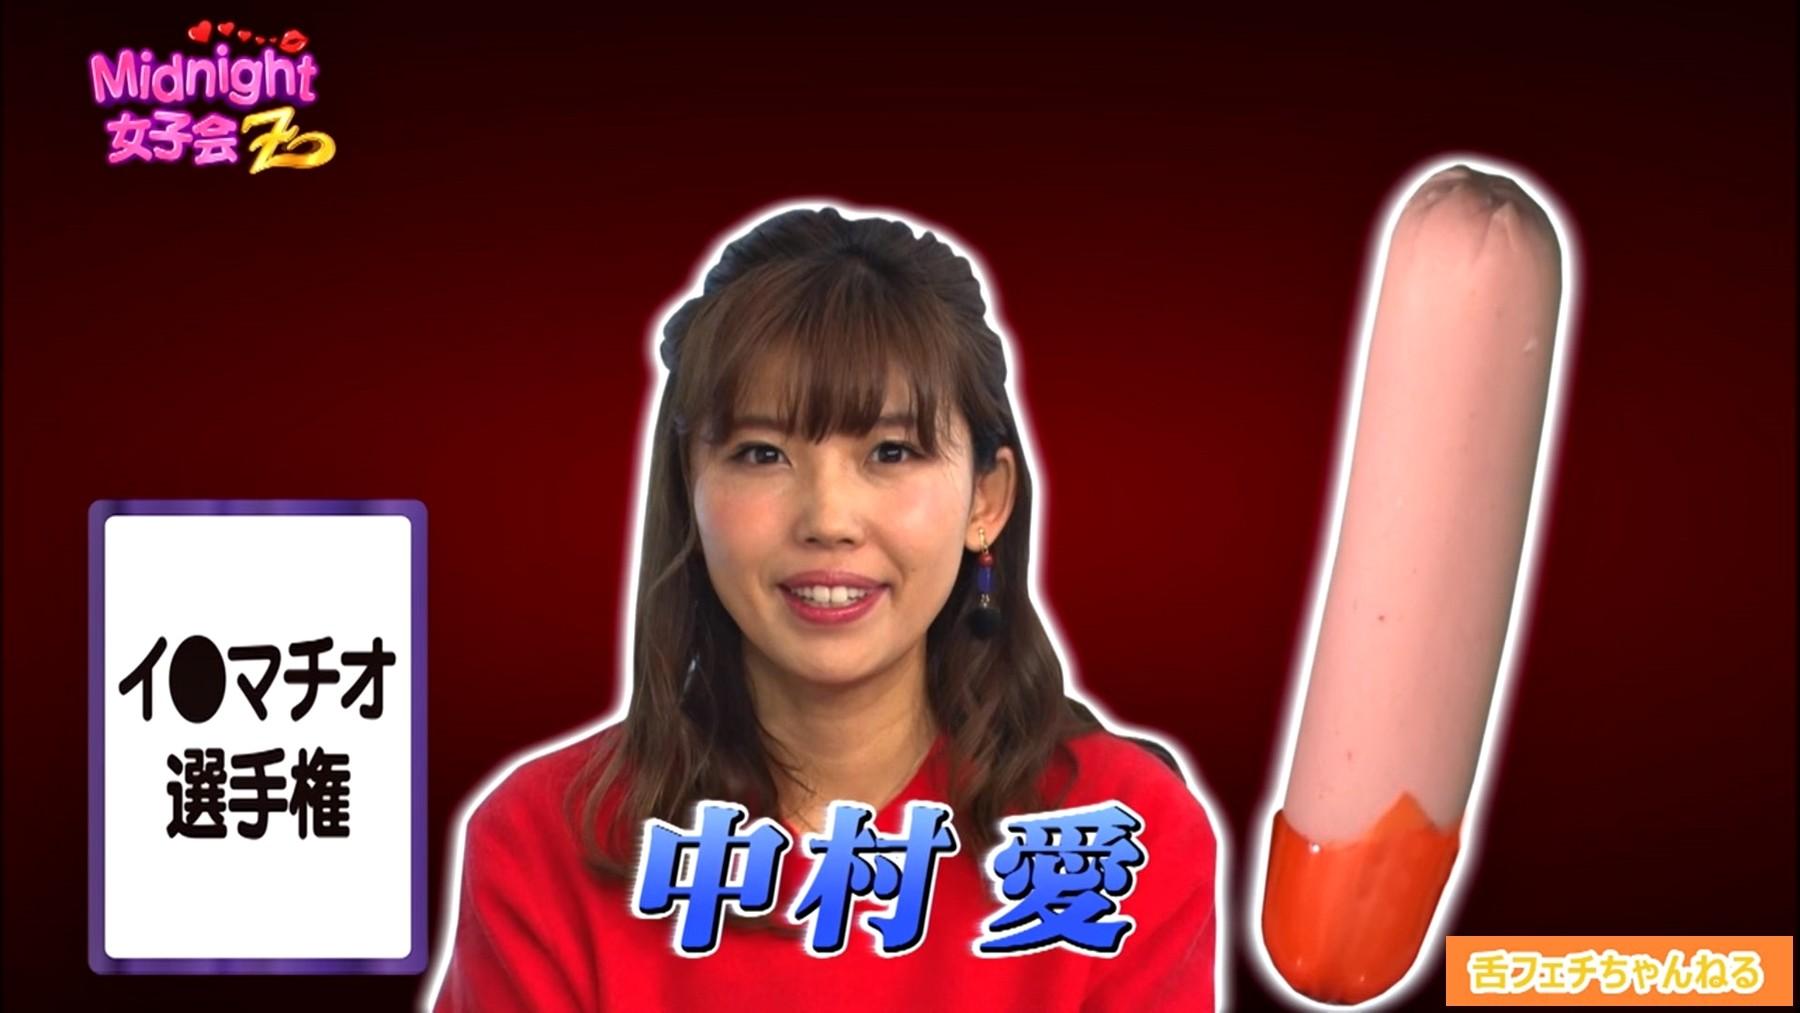 Midnight女子会 イラマチオ選手権 (28)